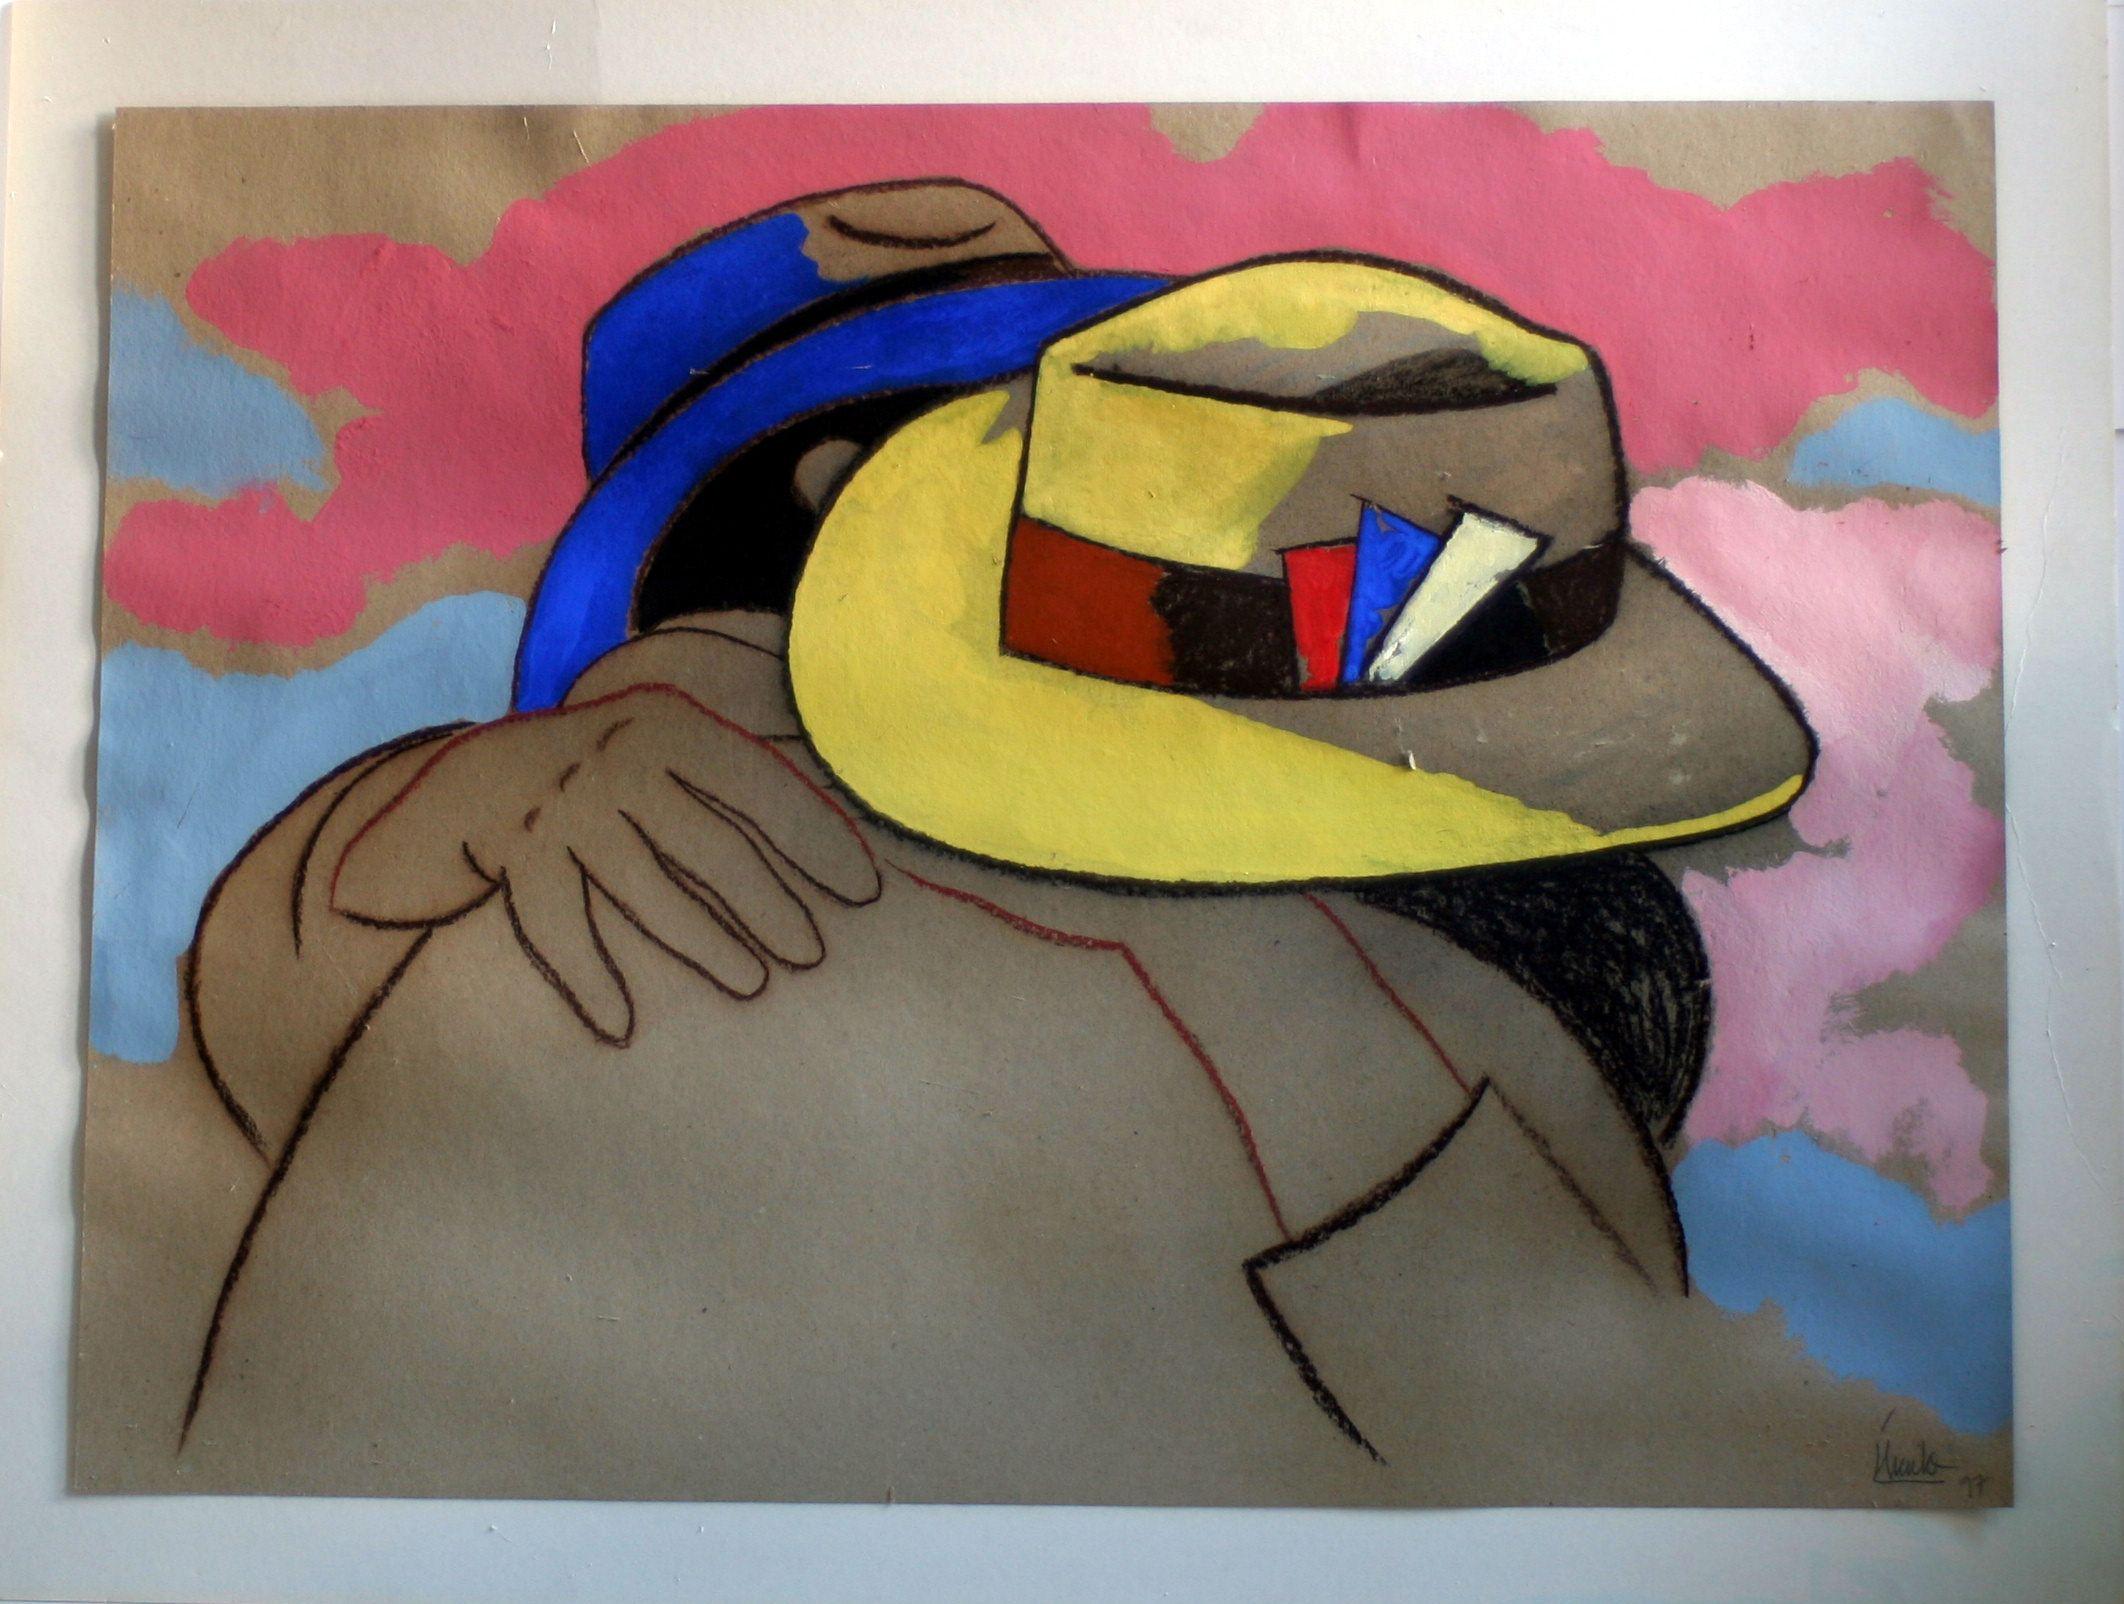 La figura del viajero Eduardo Úrculo es un pintor español. Su obra ...